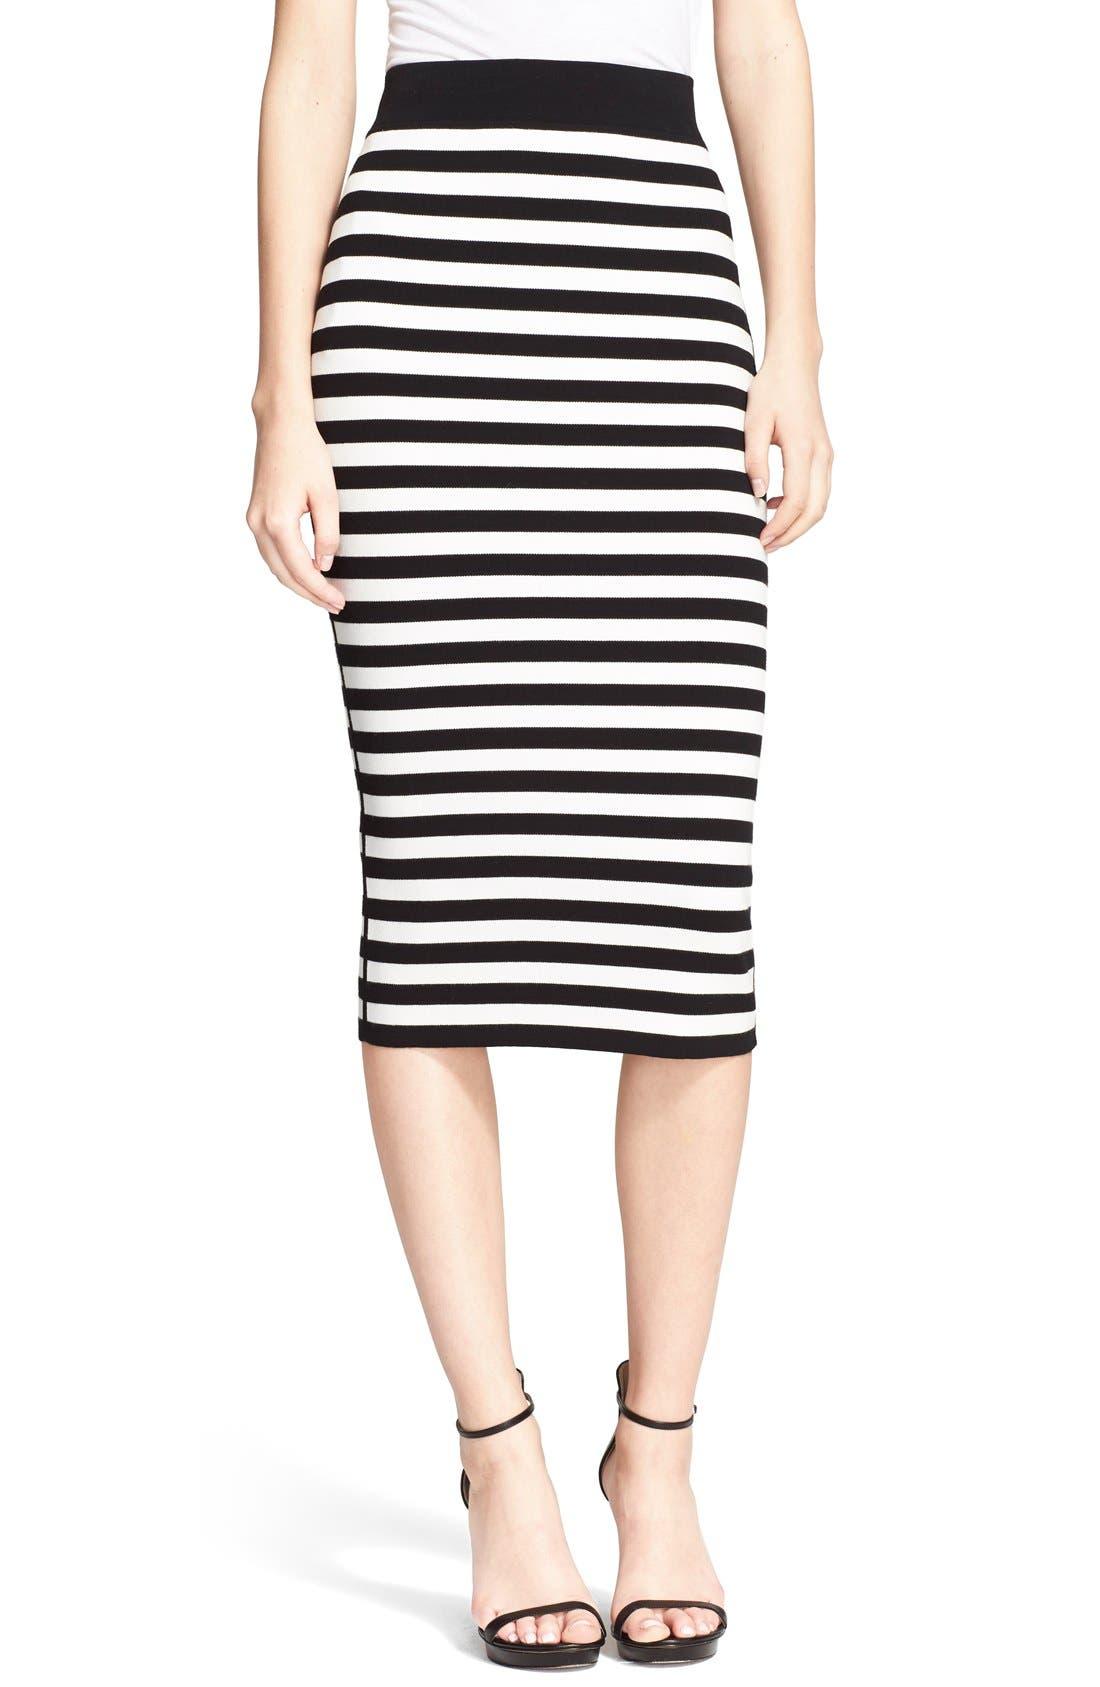 Main Image - Michael Kors Stripe Knit Pencil Skirt